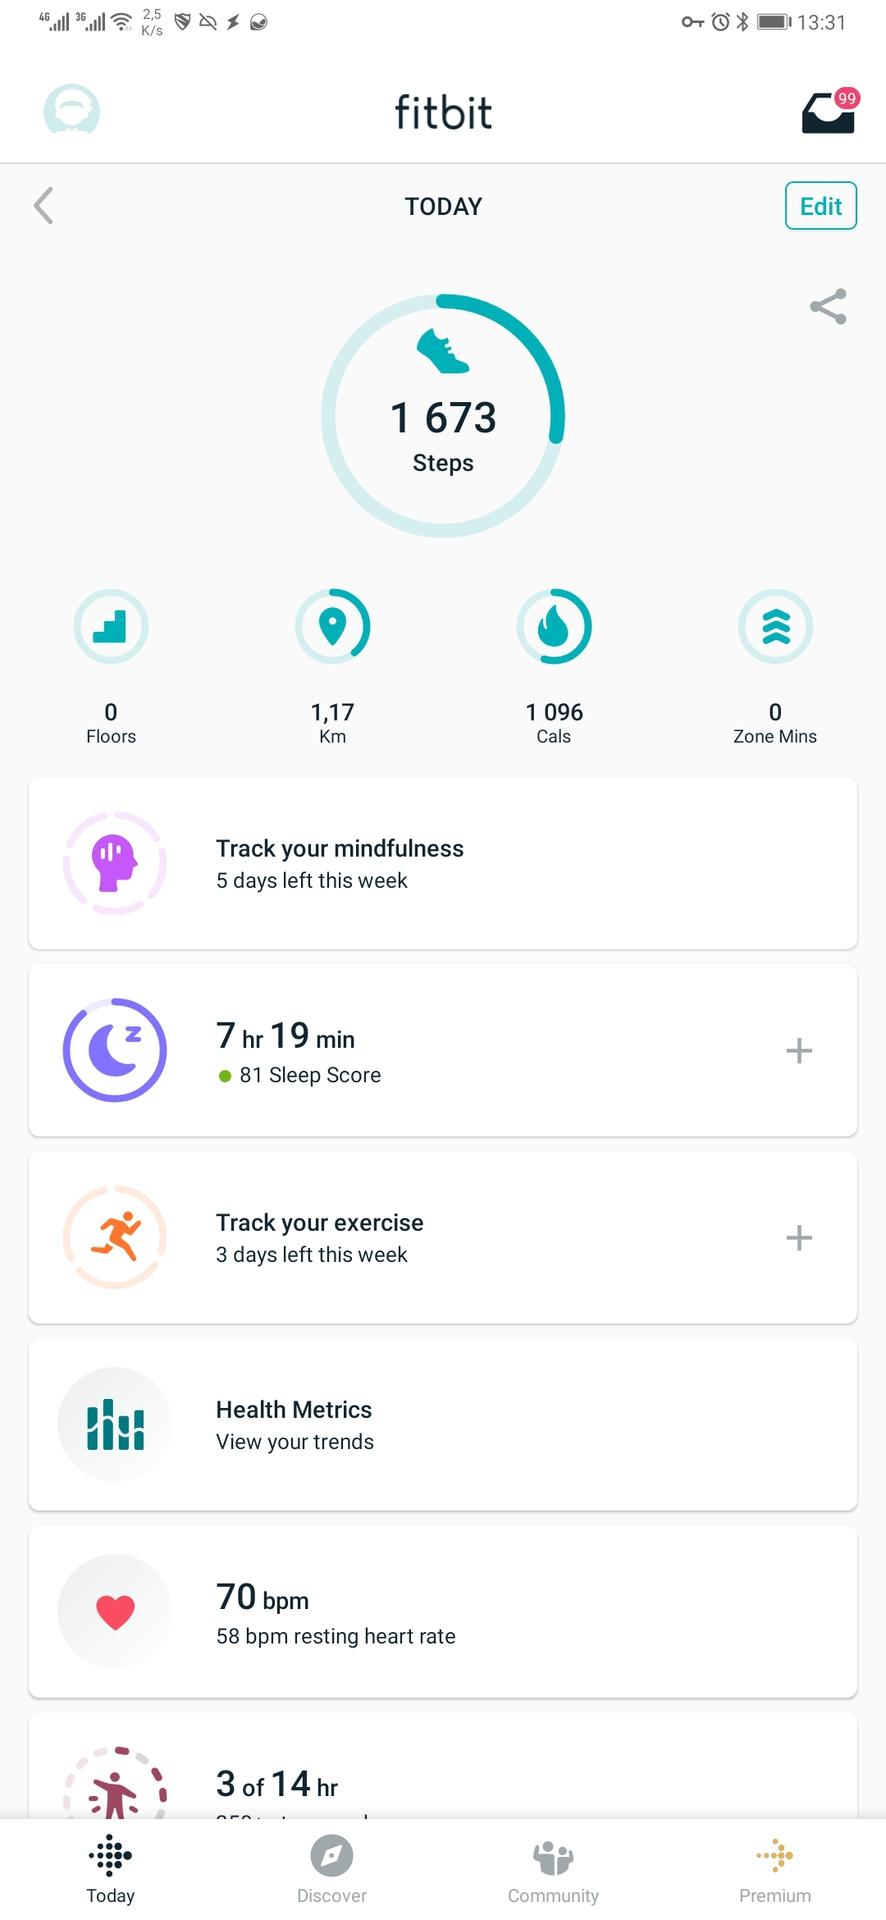 fitbit app stats